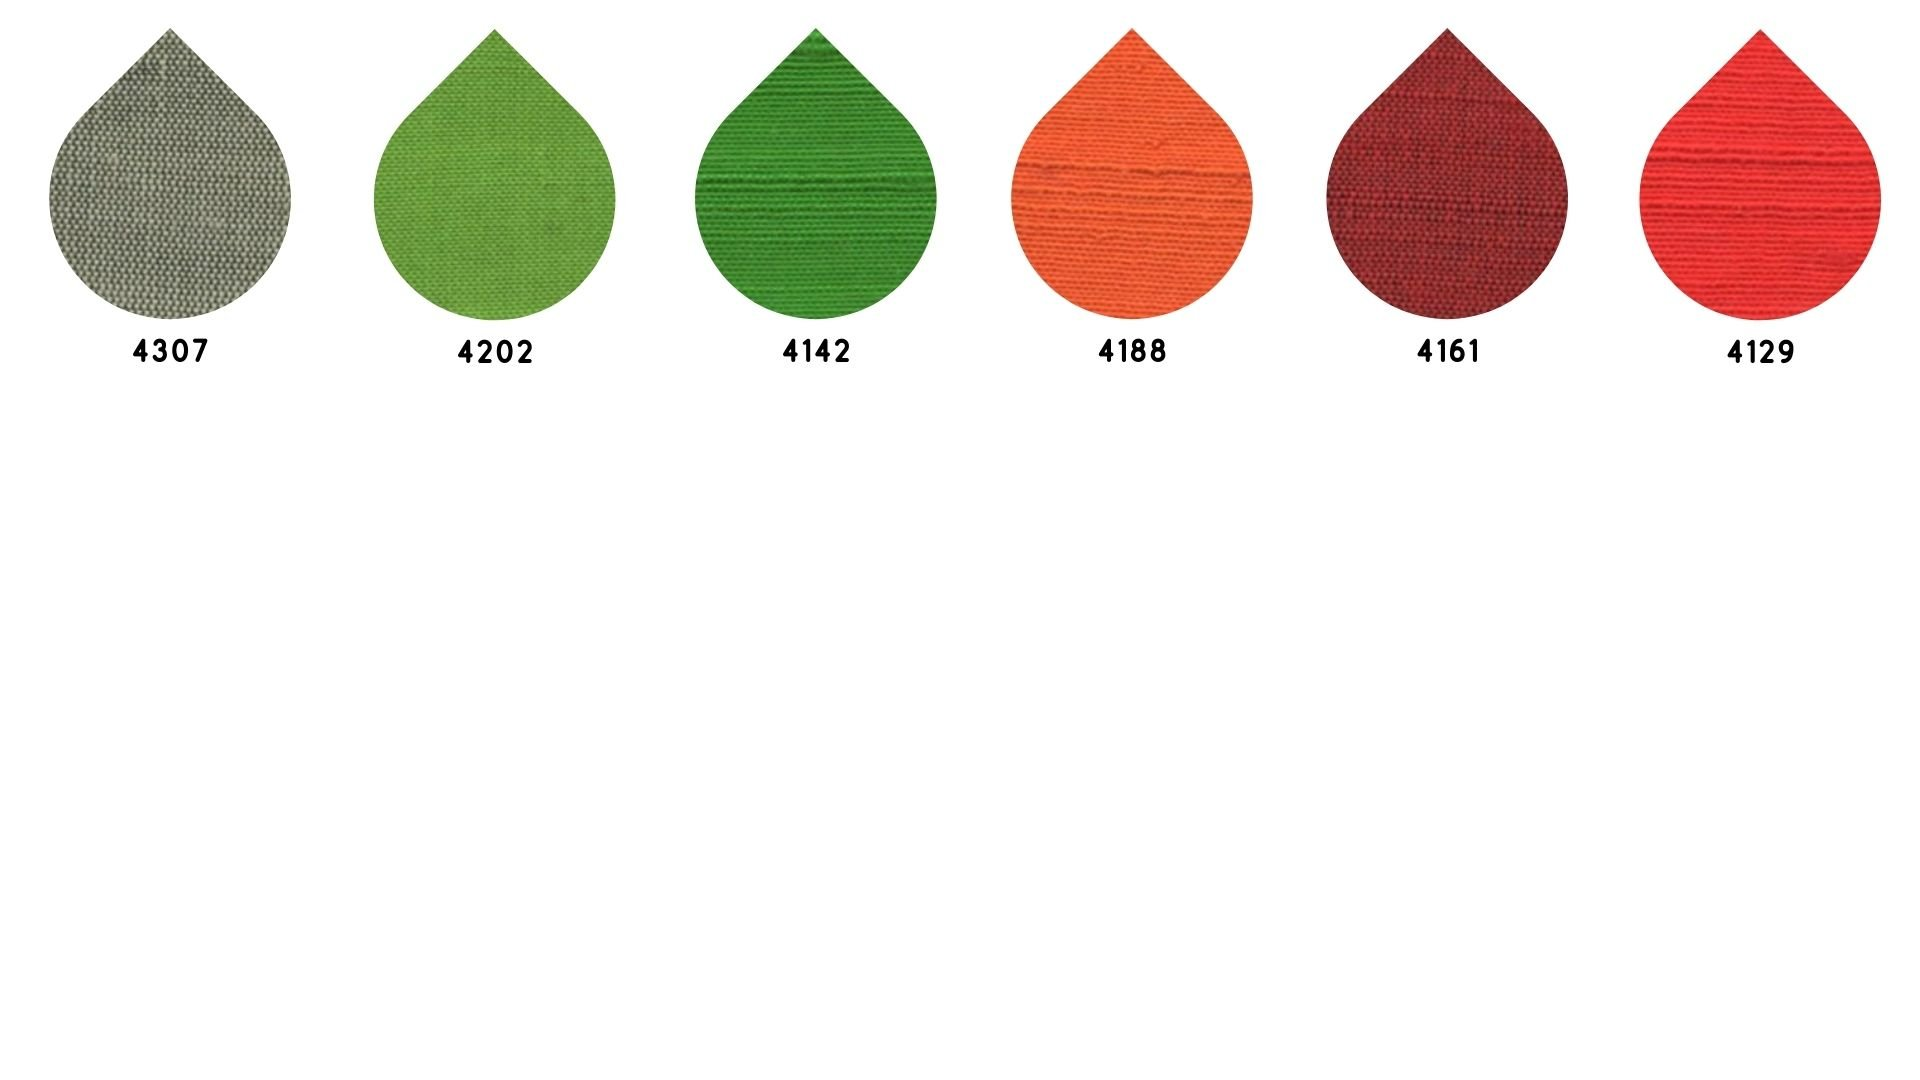 la cartella colore del tessuto superior smog shantung tex di Leadford & Logan